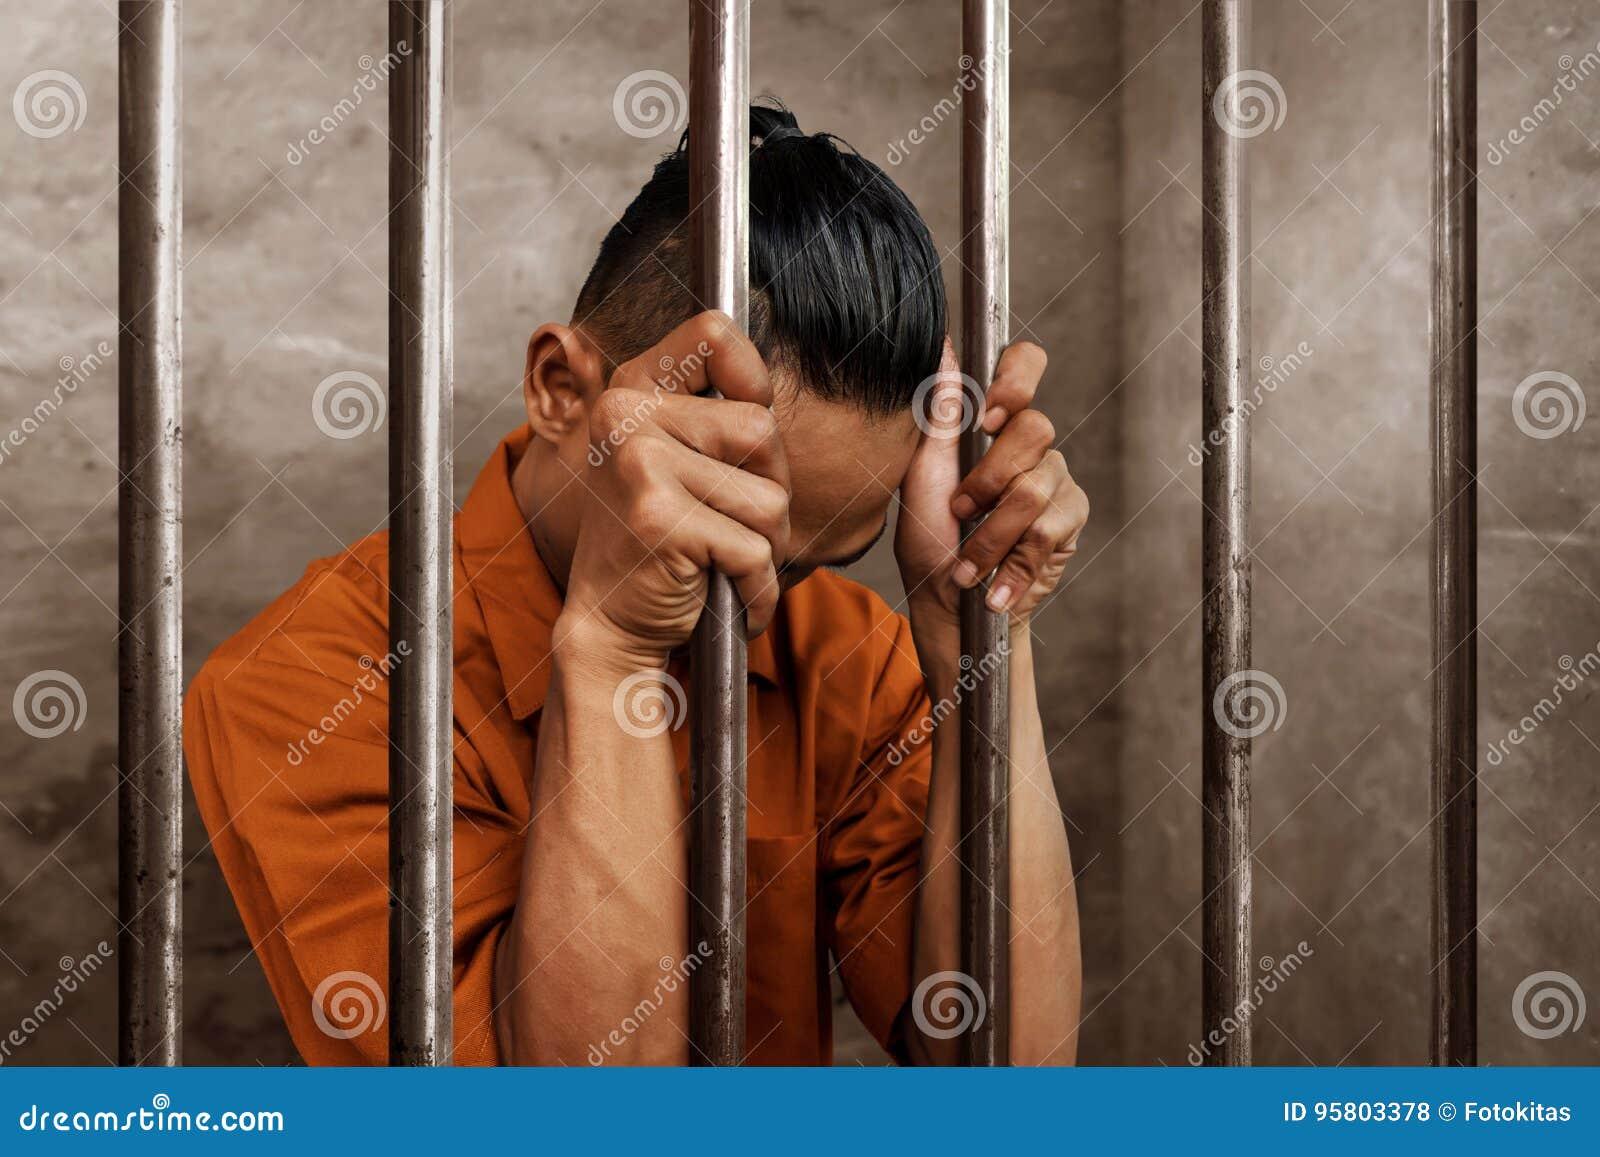 in prison Asian